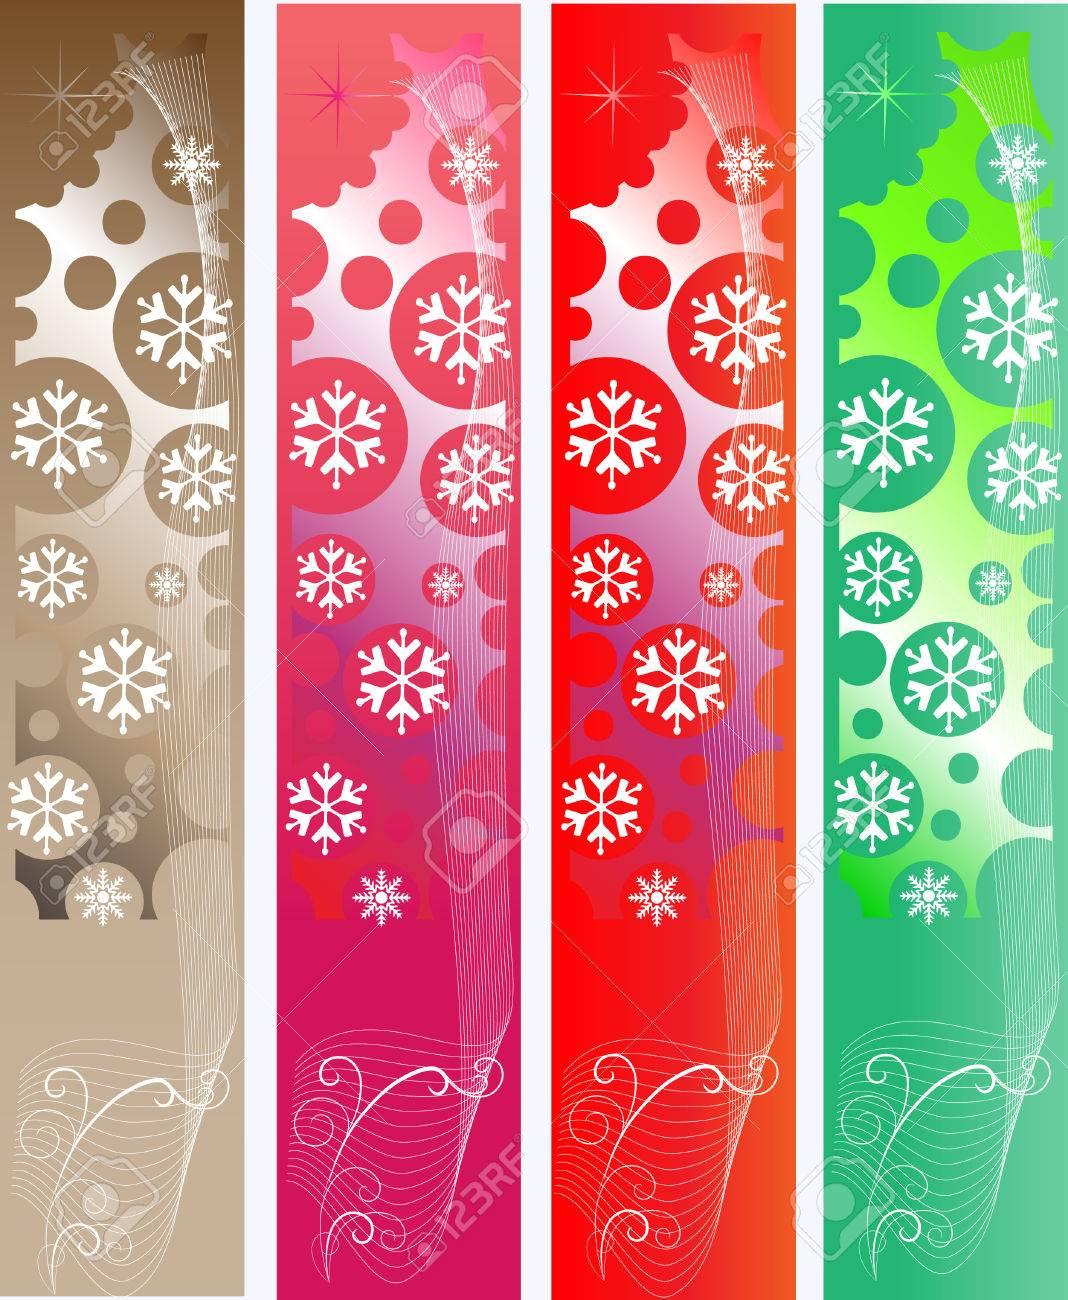 Abstract Christmas Banners Stock Vector - 5570526